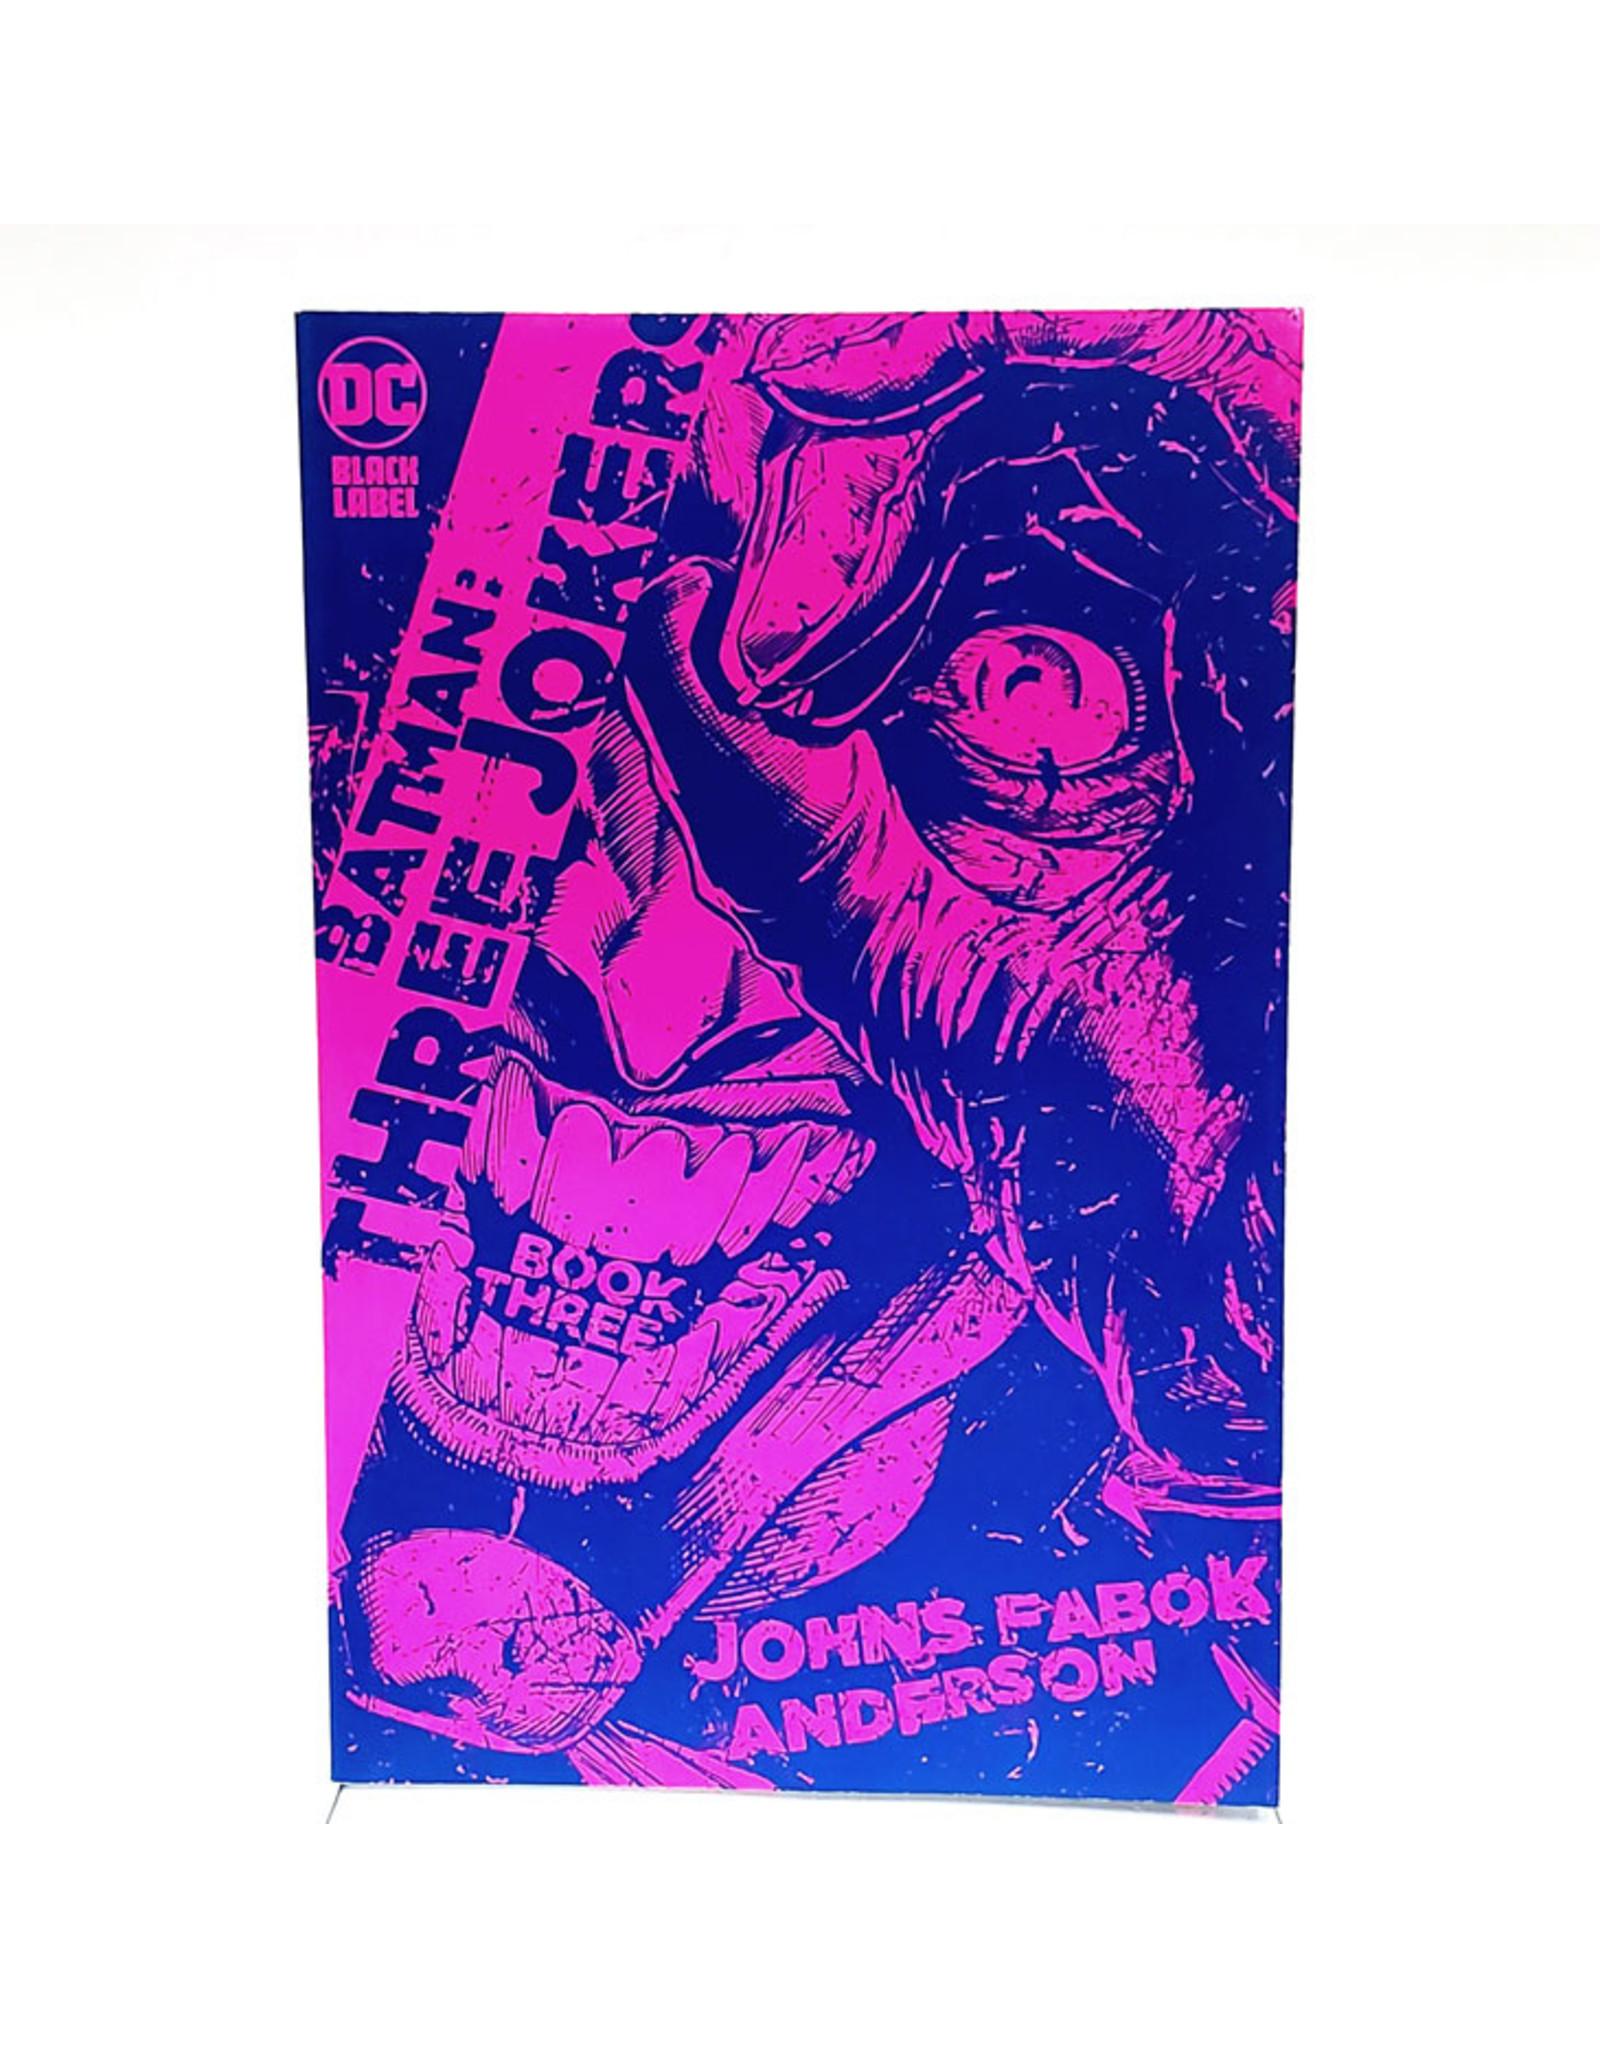 DC COMICS BATMAN THREE JOKERS #3 (OF 3) 1:25 JASON FABOK PURPLE VARIANT